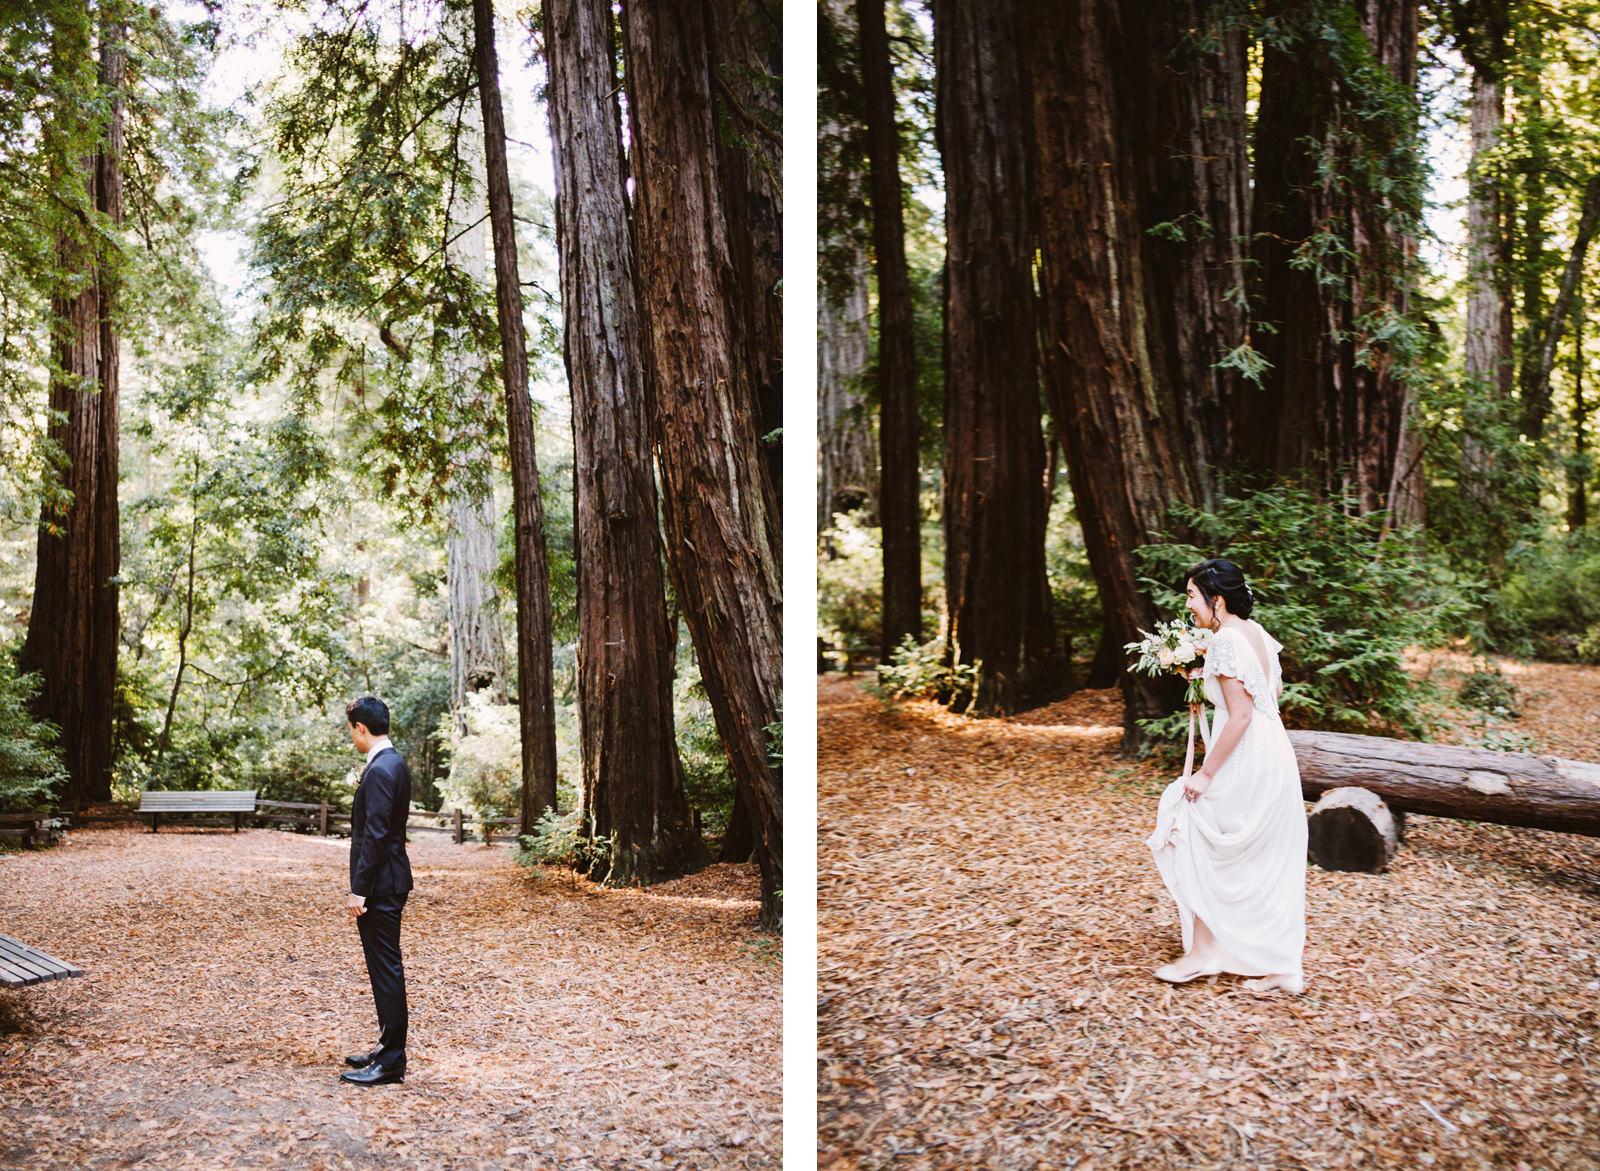 kimclay-blog-005 REDWOOD FOREST WEDDING